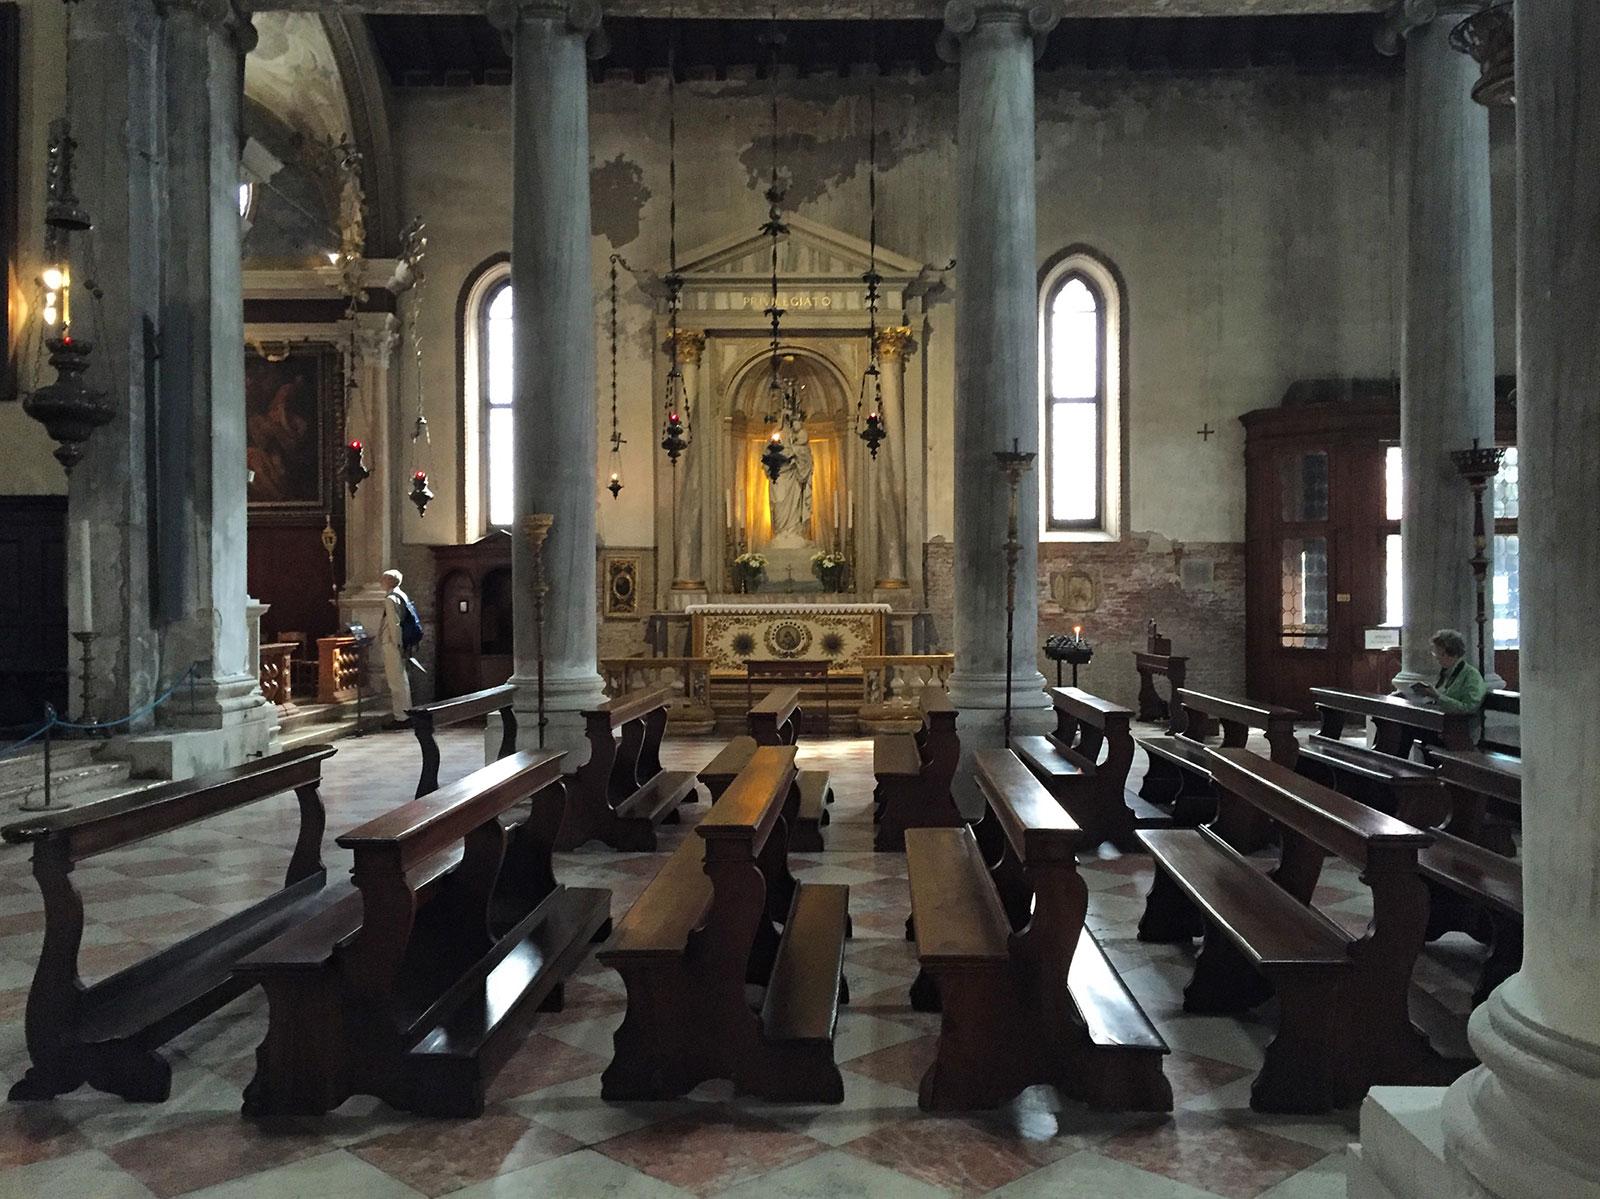 The church of San Polo